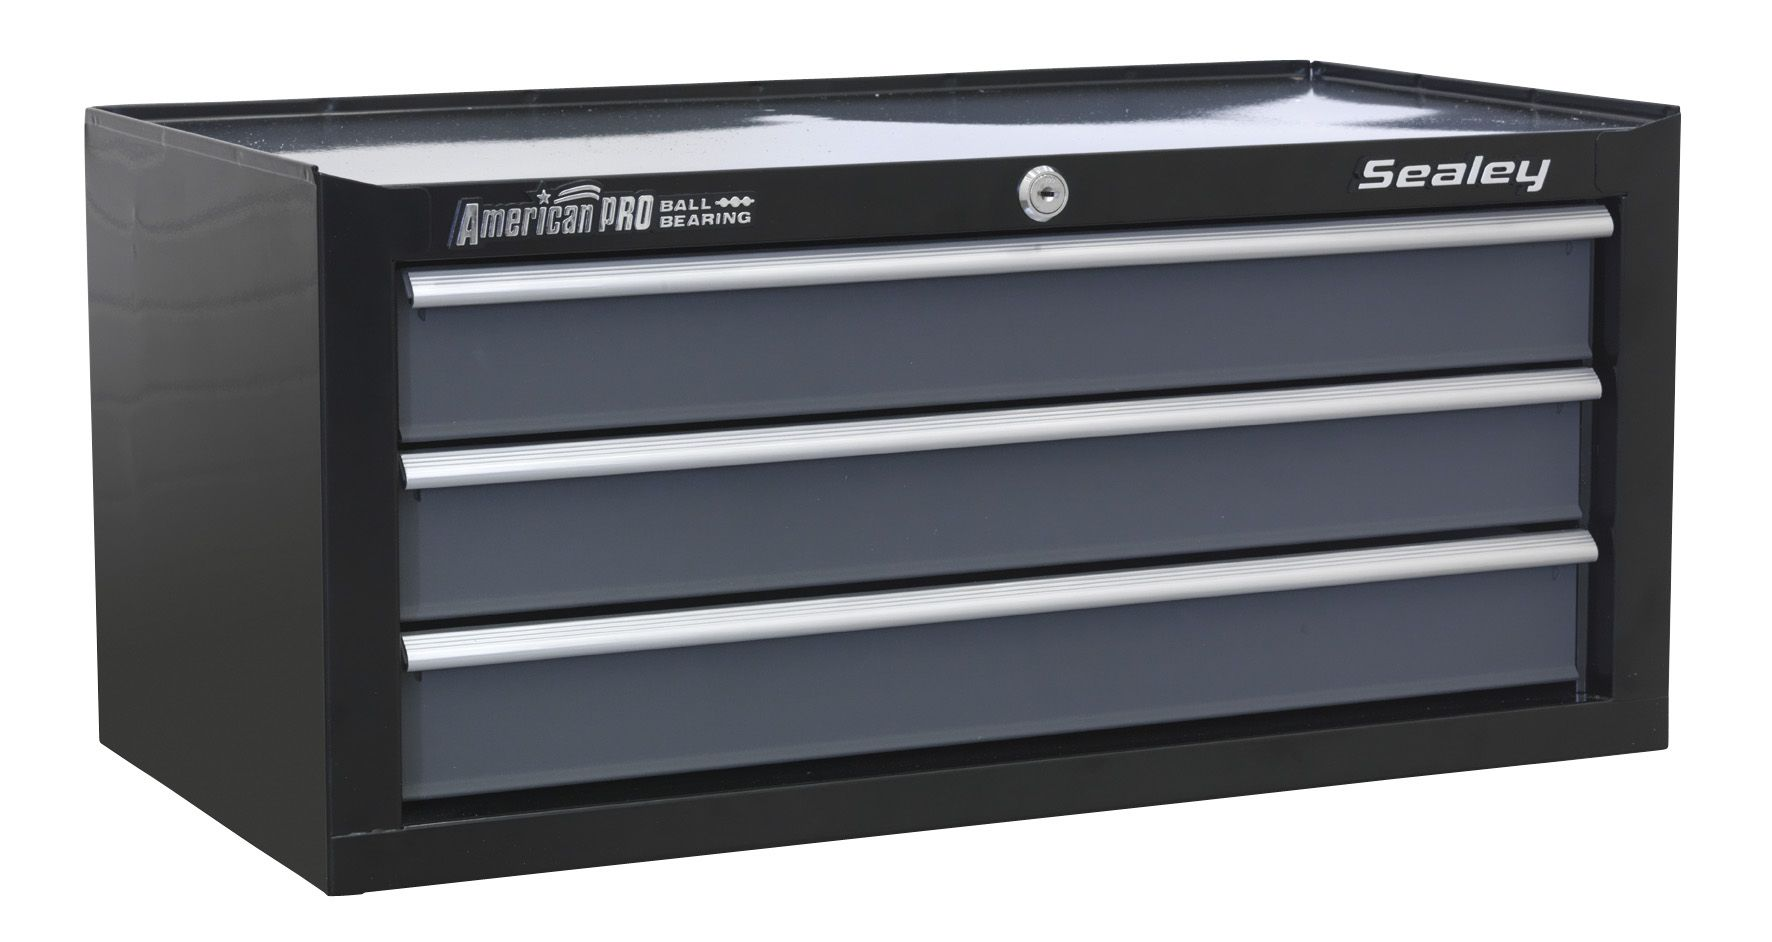 Sealey American Pro Mid-Box 3 Drawer with Ball Bearing Slides - Black/Grey